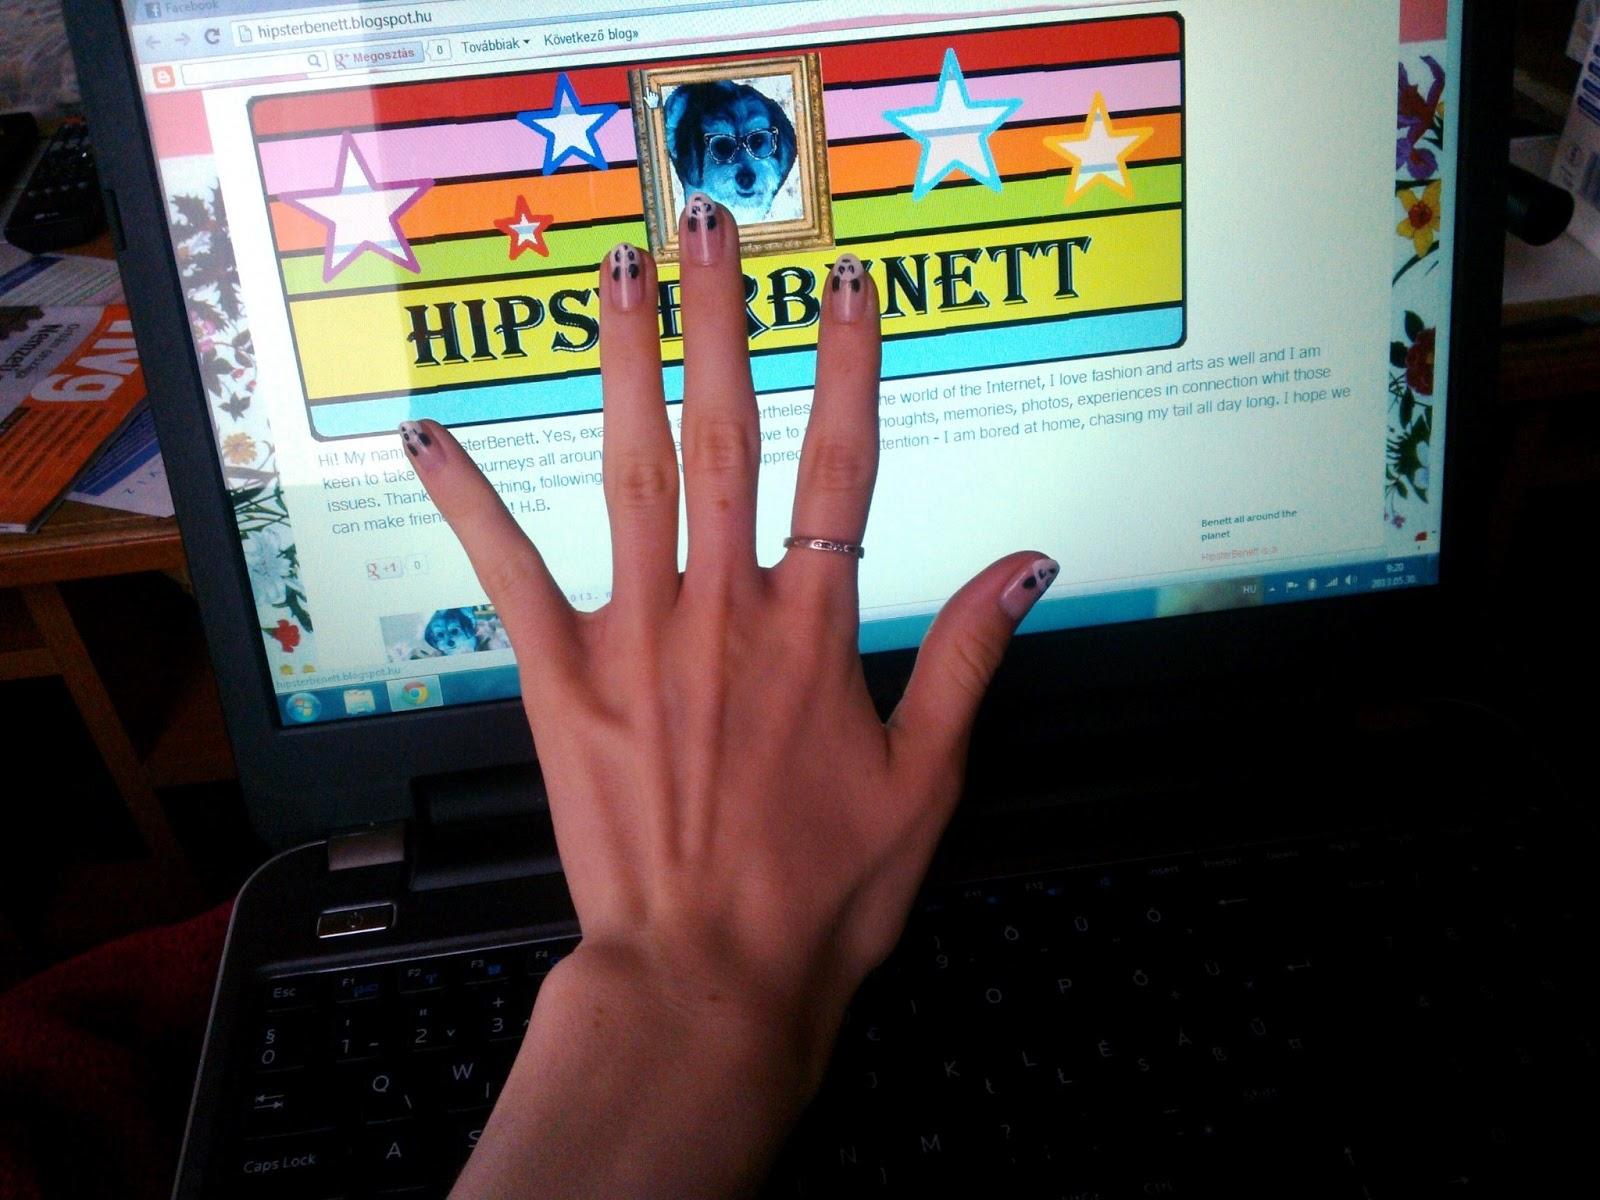 The Amusing Spring nail designs 2015 Digital Imagery